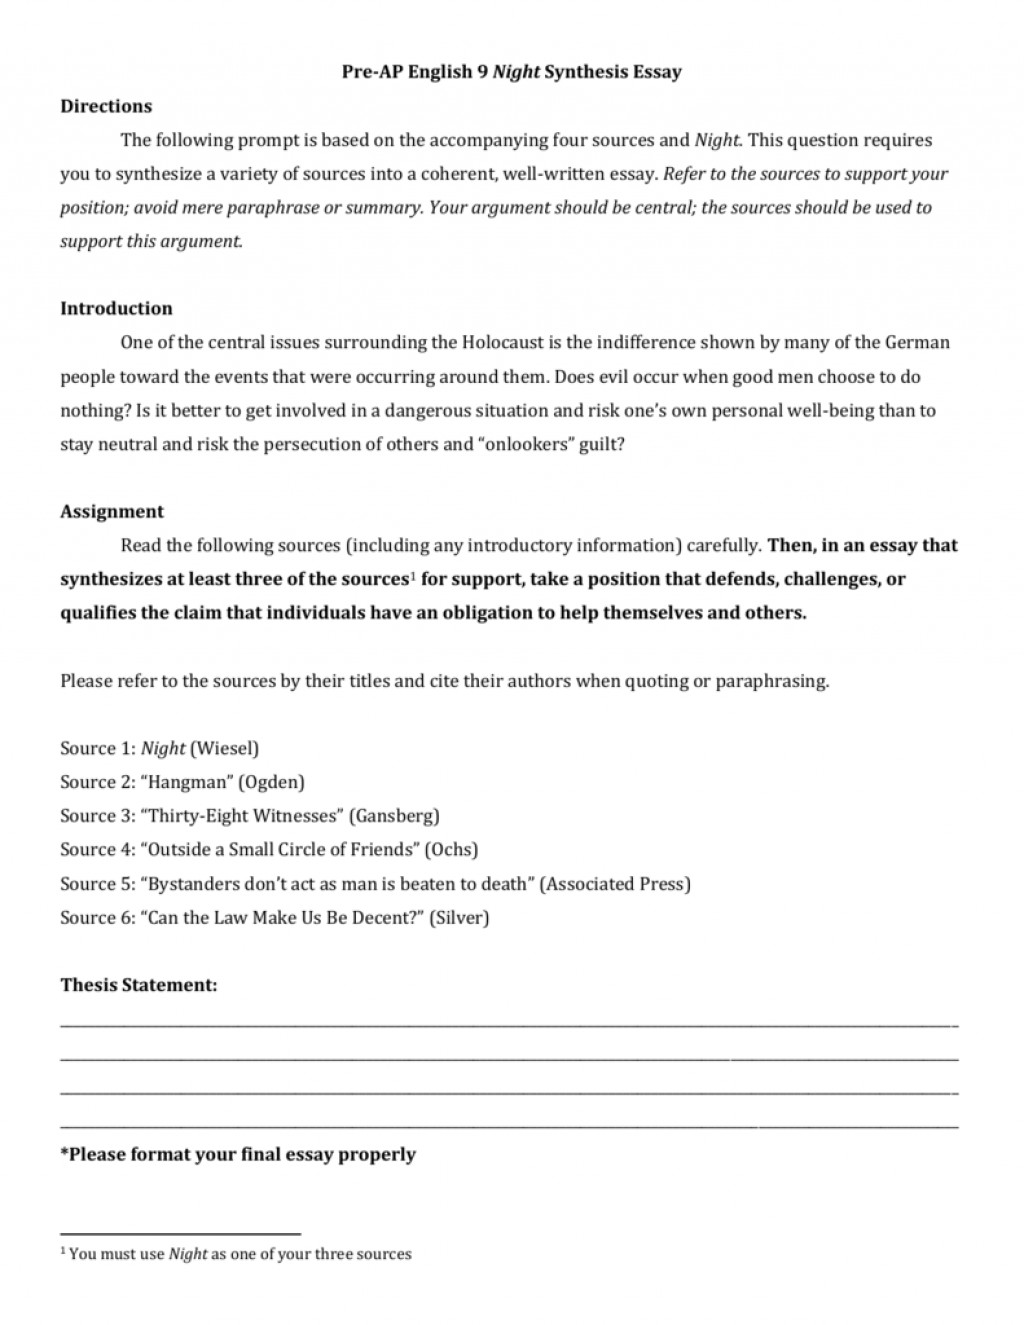 003 006963363 1 Synthesis Essay Sensational Prompt Outline Pdf Large